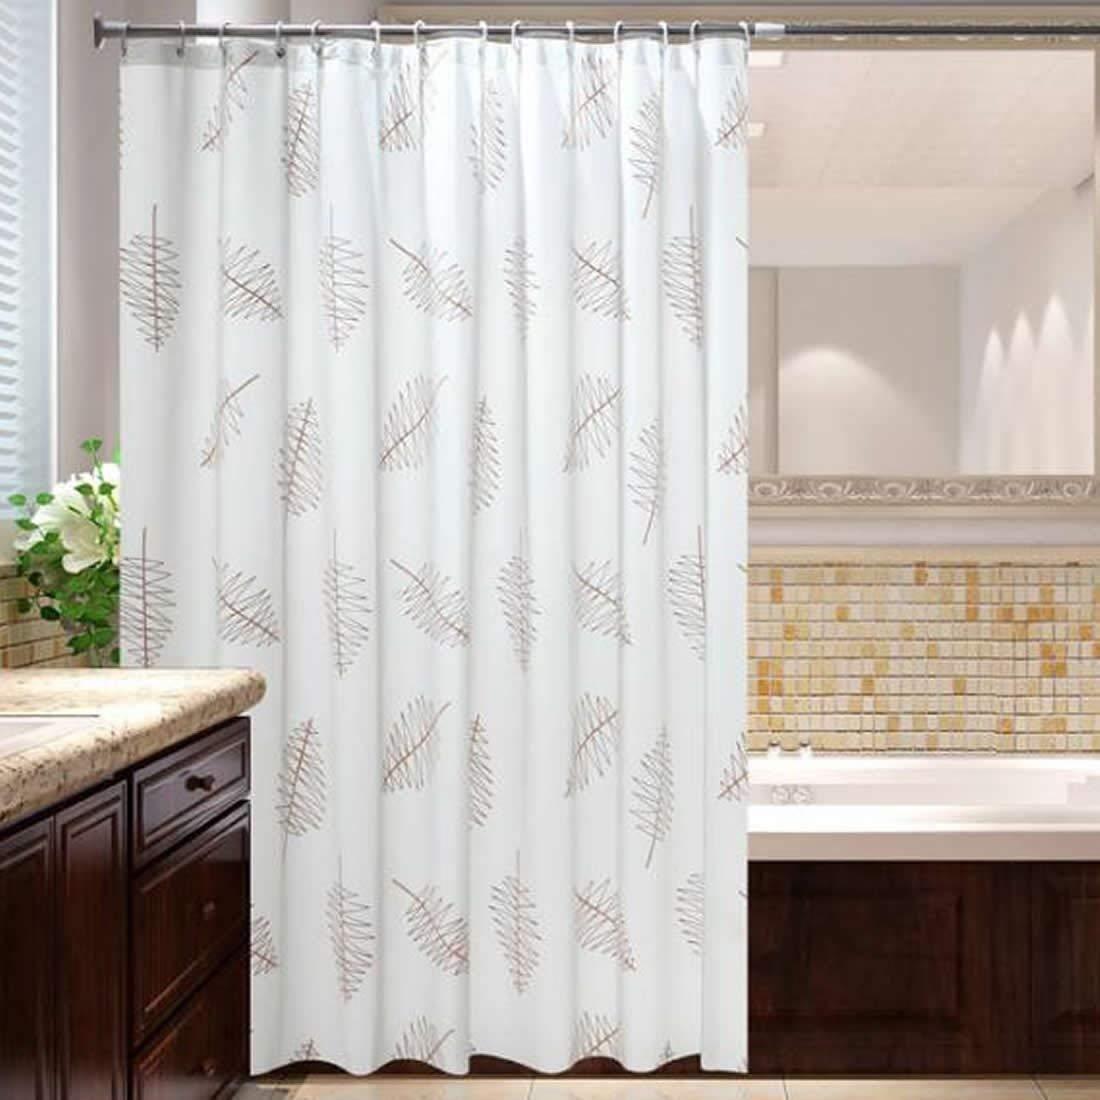 Mangetal Shower Curtain Liner Mildew Resistant Anti Bacterial Waterproof Water  Repellent Long Fabric Shower Curtains For ...